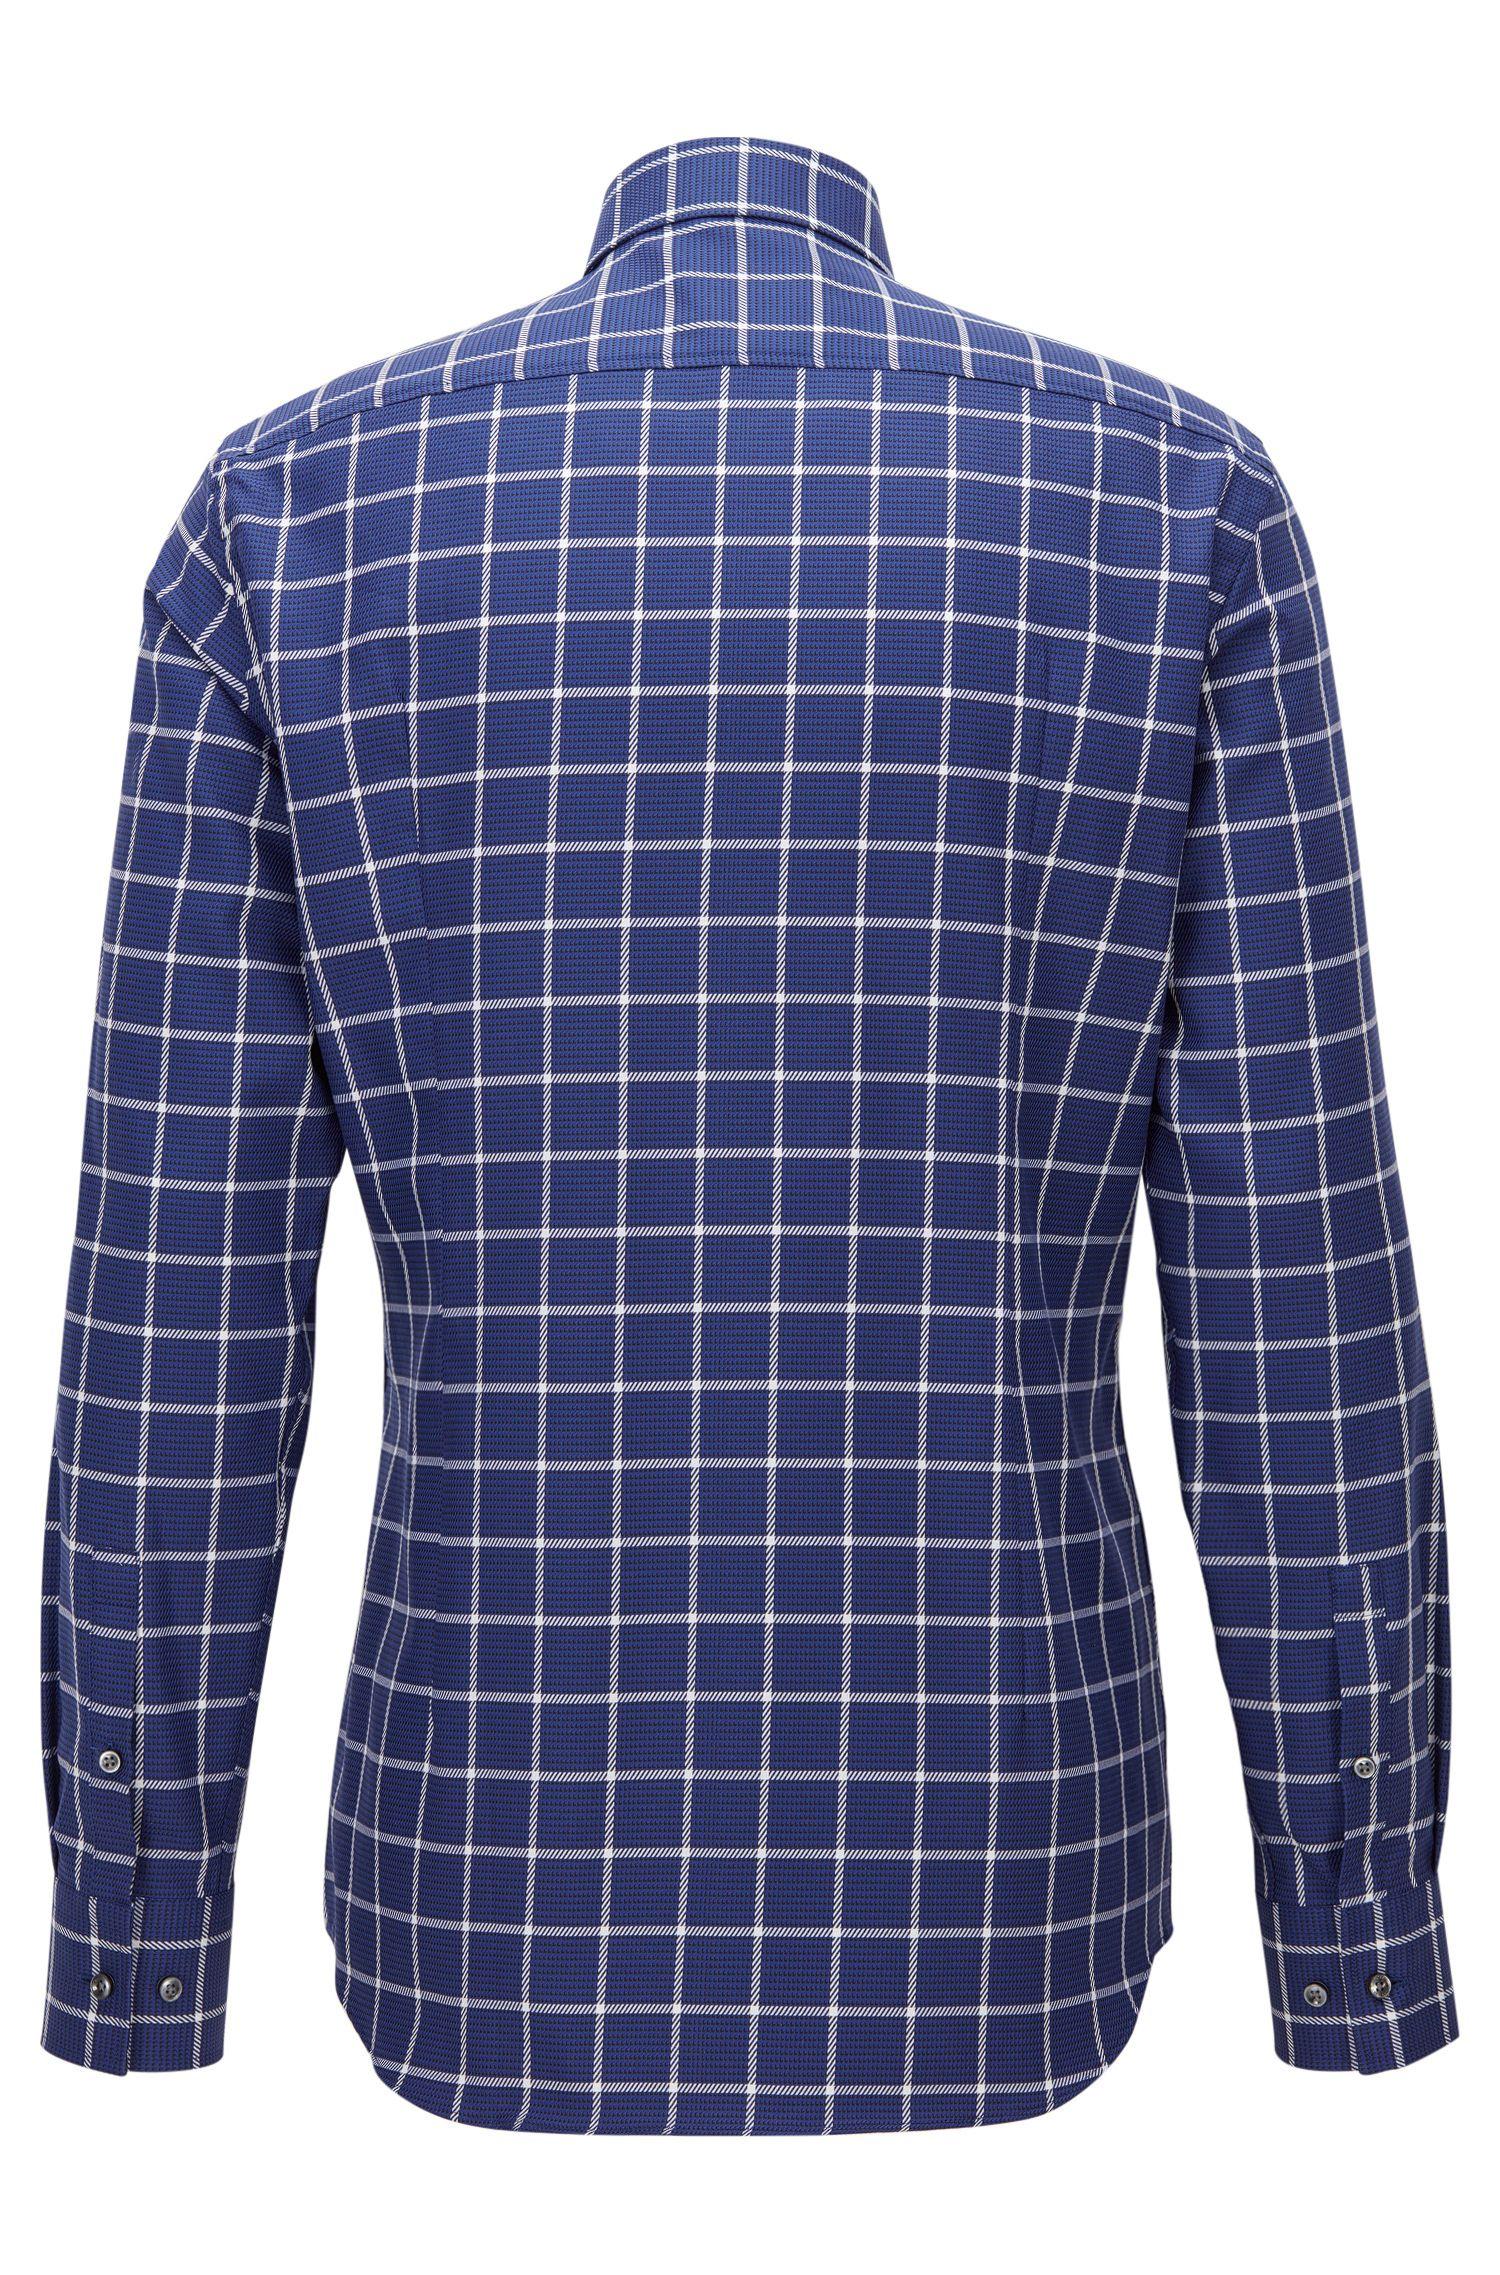 Plaid Cotton Dress Shirt, Slim Fit | Jason